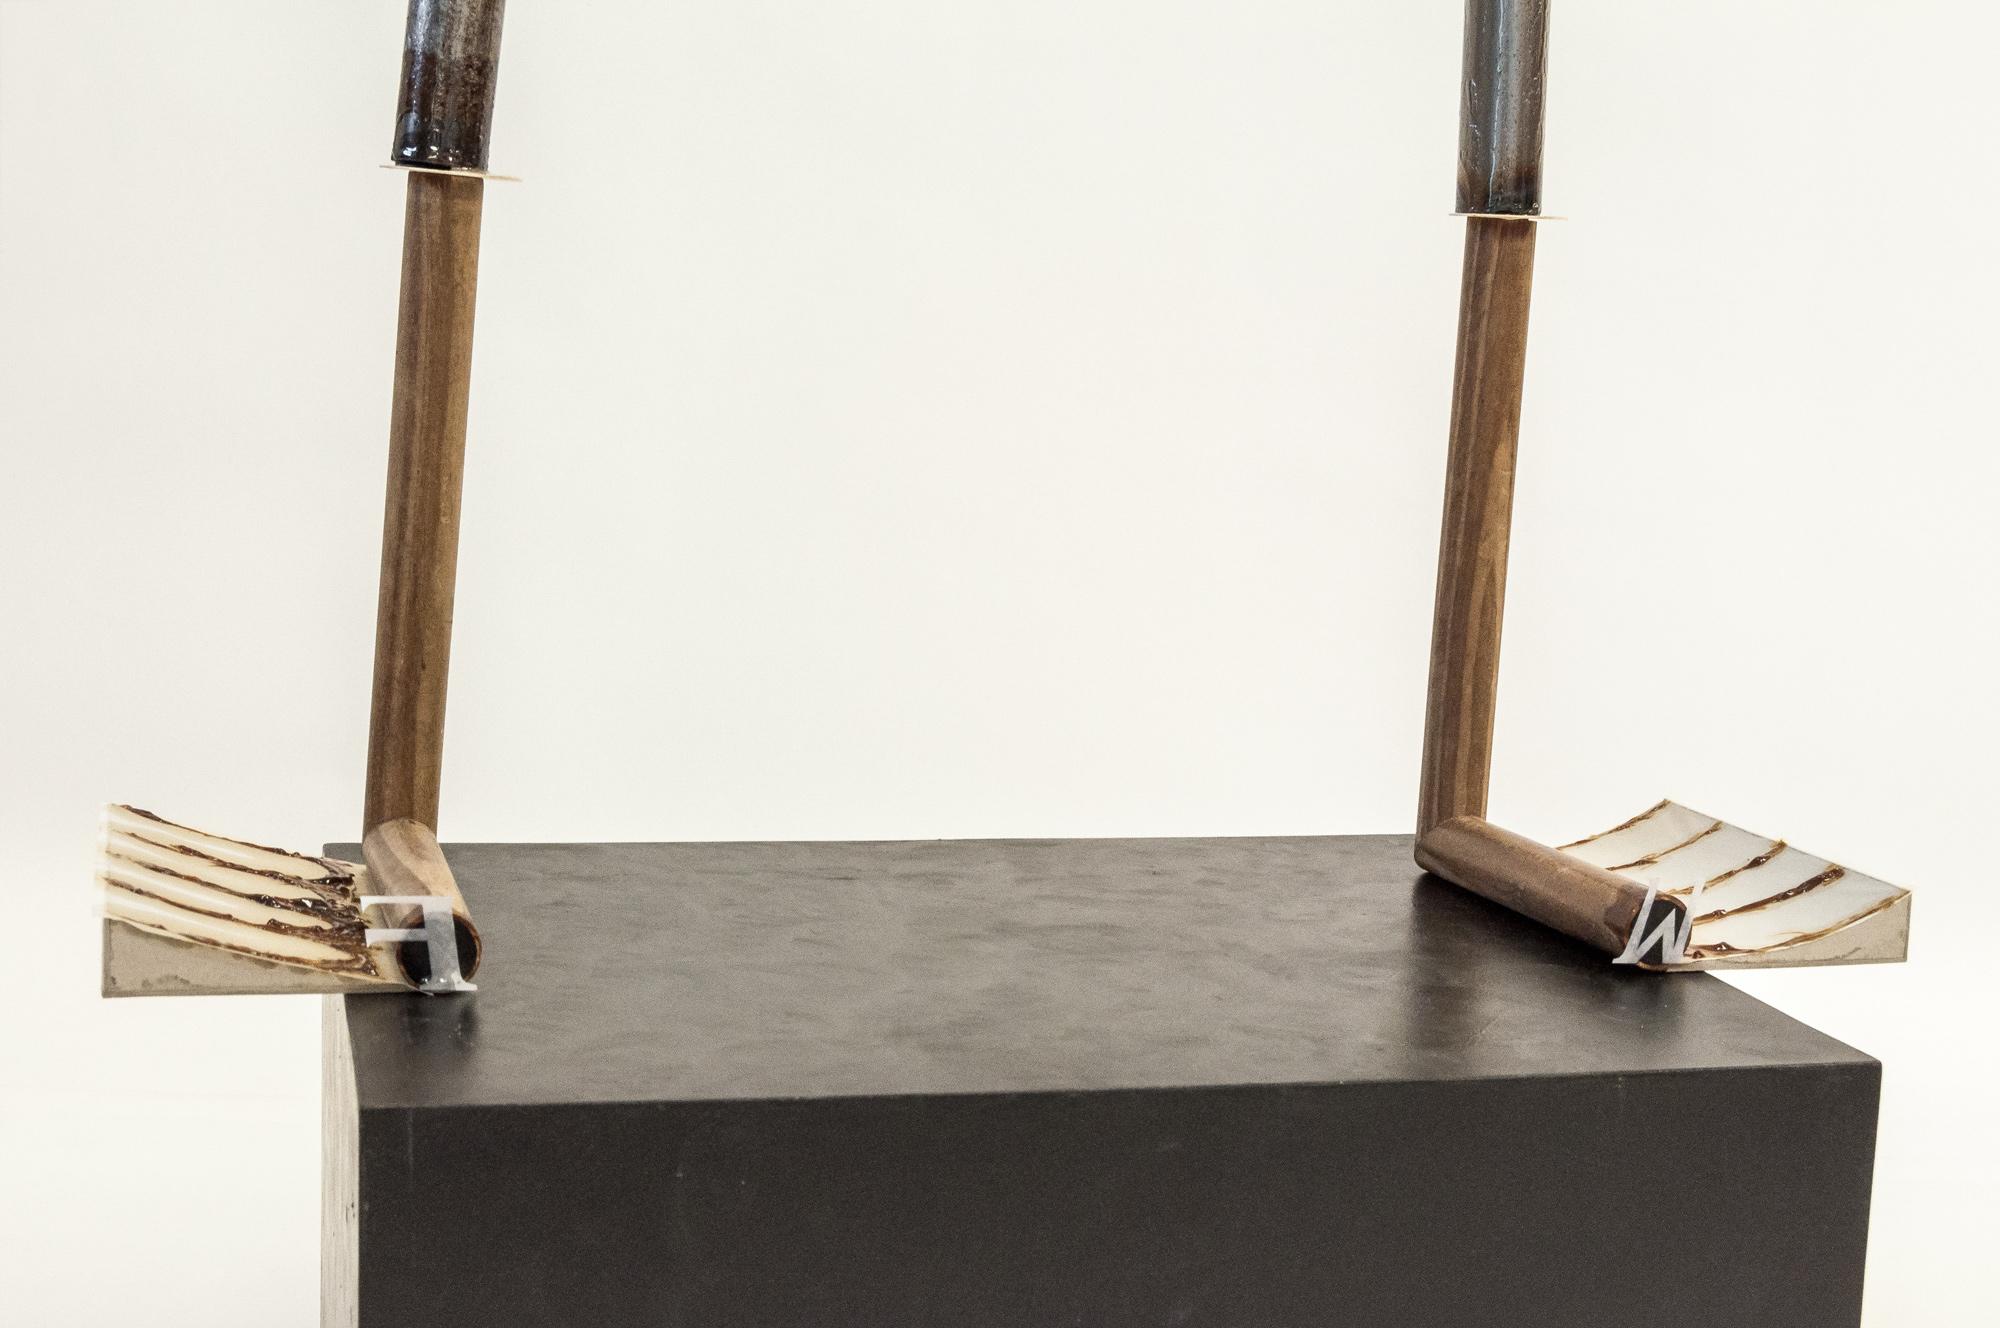 FW │ metal, wood, cardboard, paper │ 2020 │ 77cm x 67cm x 42cm